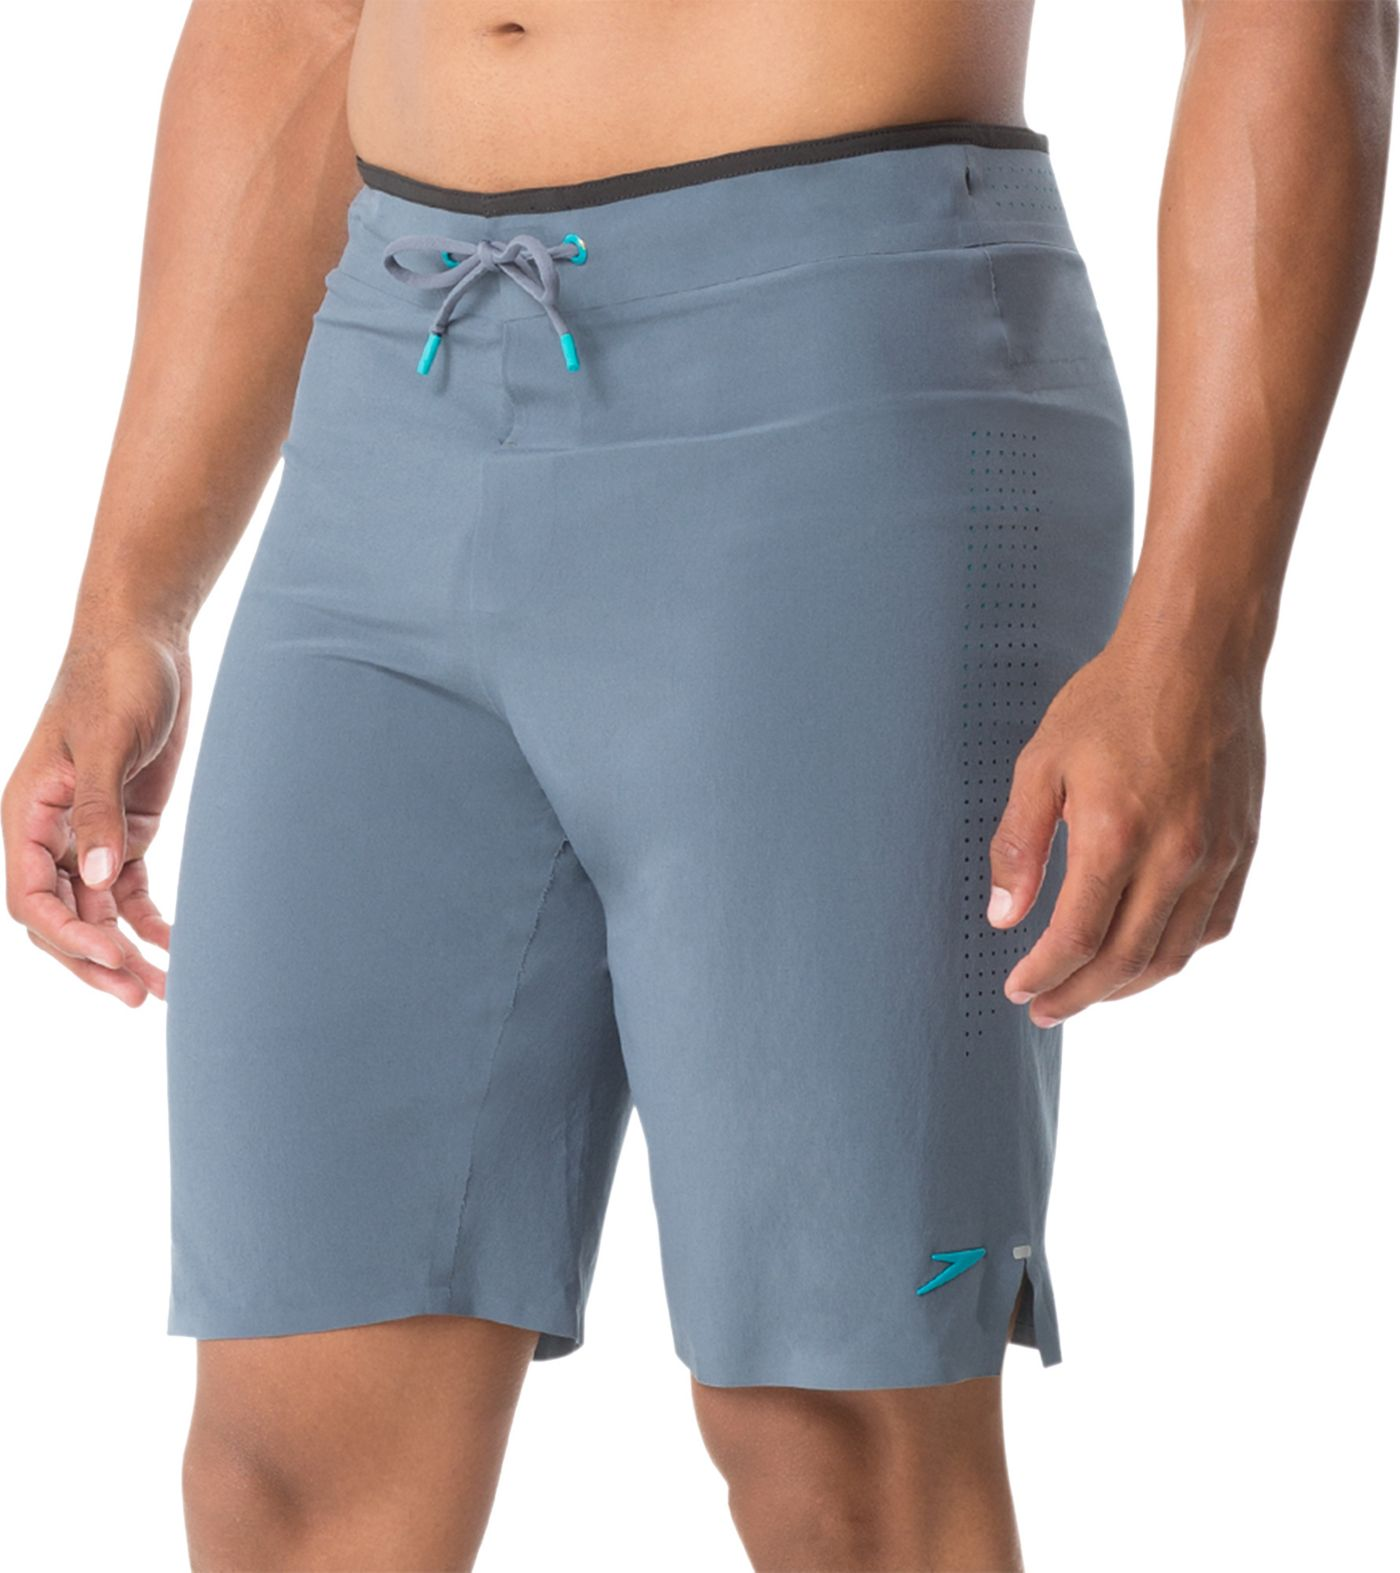 Speedo Men's Hydrovent Elite Board Shorts